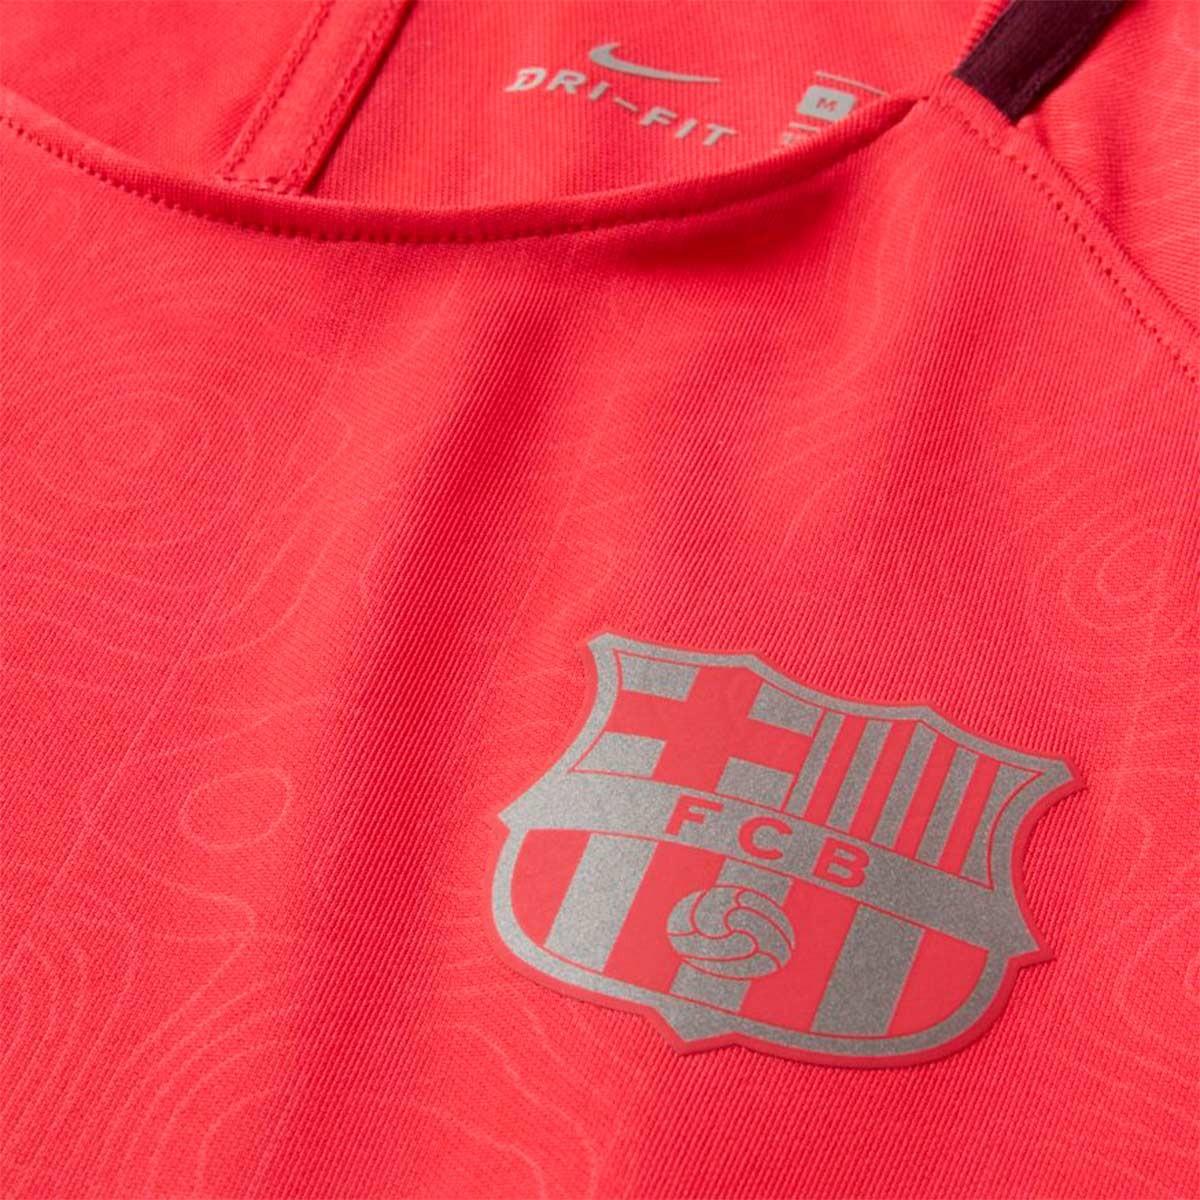 9d02396d46f8f Camiseta Nike Dry FC Barcelona Squad 2018-2019 Niño Tropical pink-Deep  maroon - Tienda de fútbol Fútbol Emotion